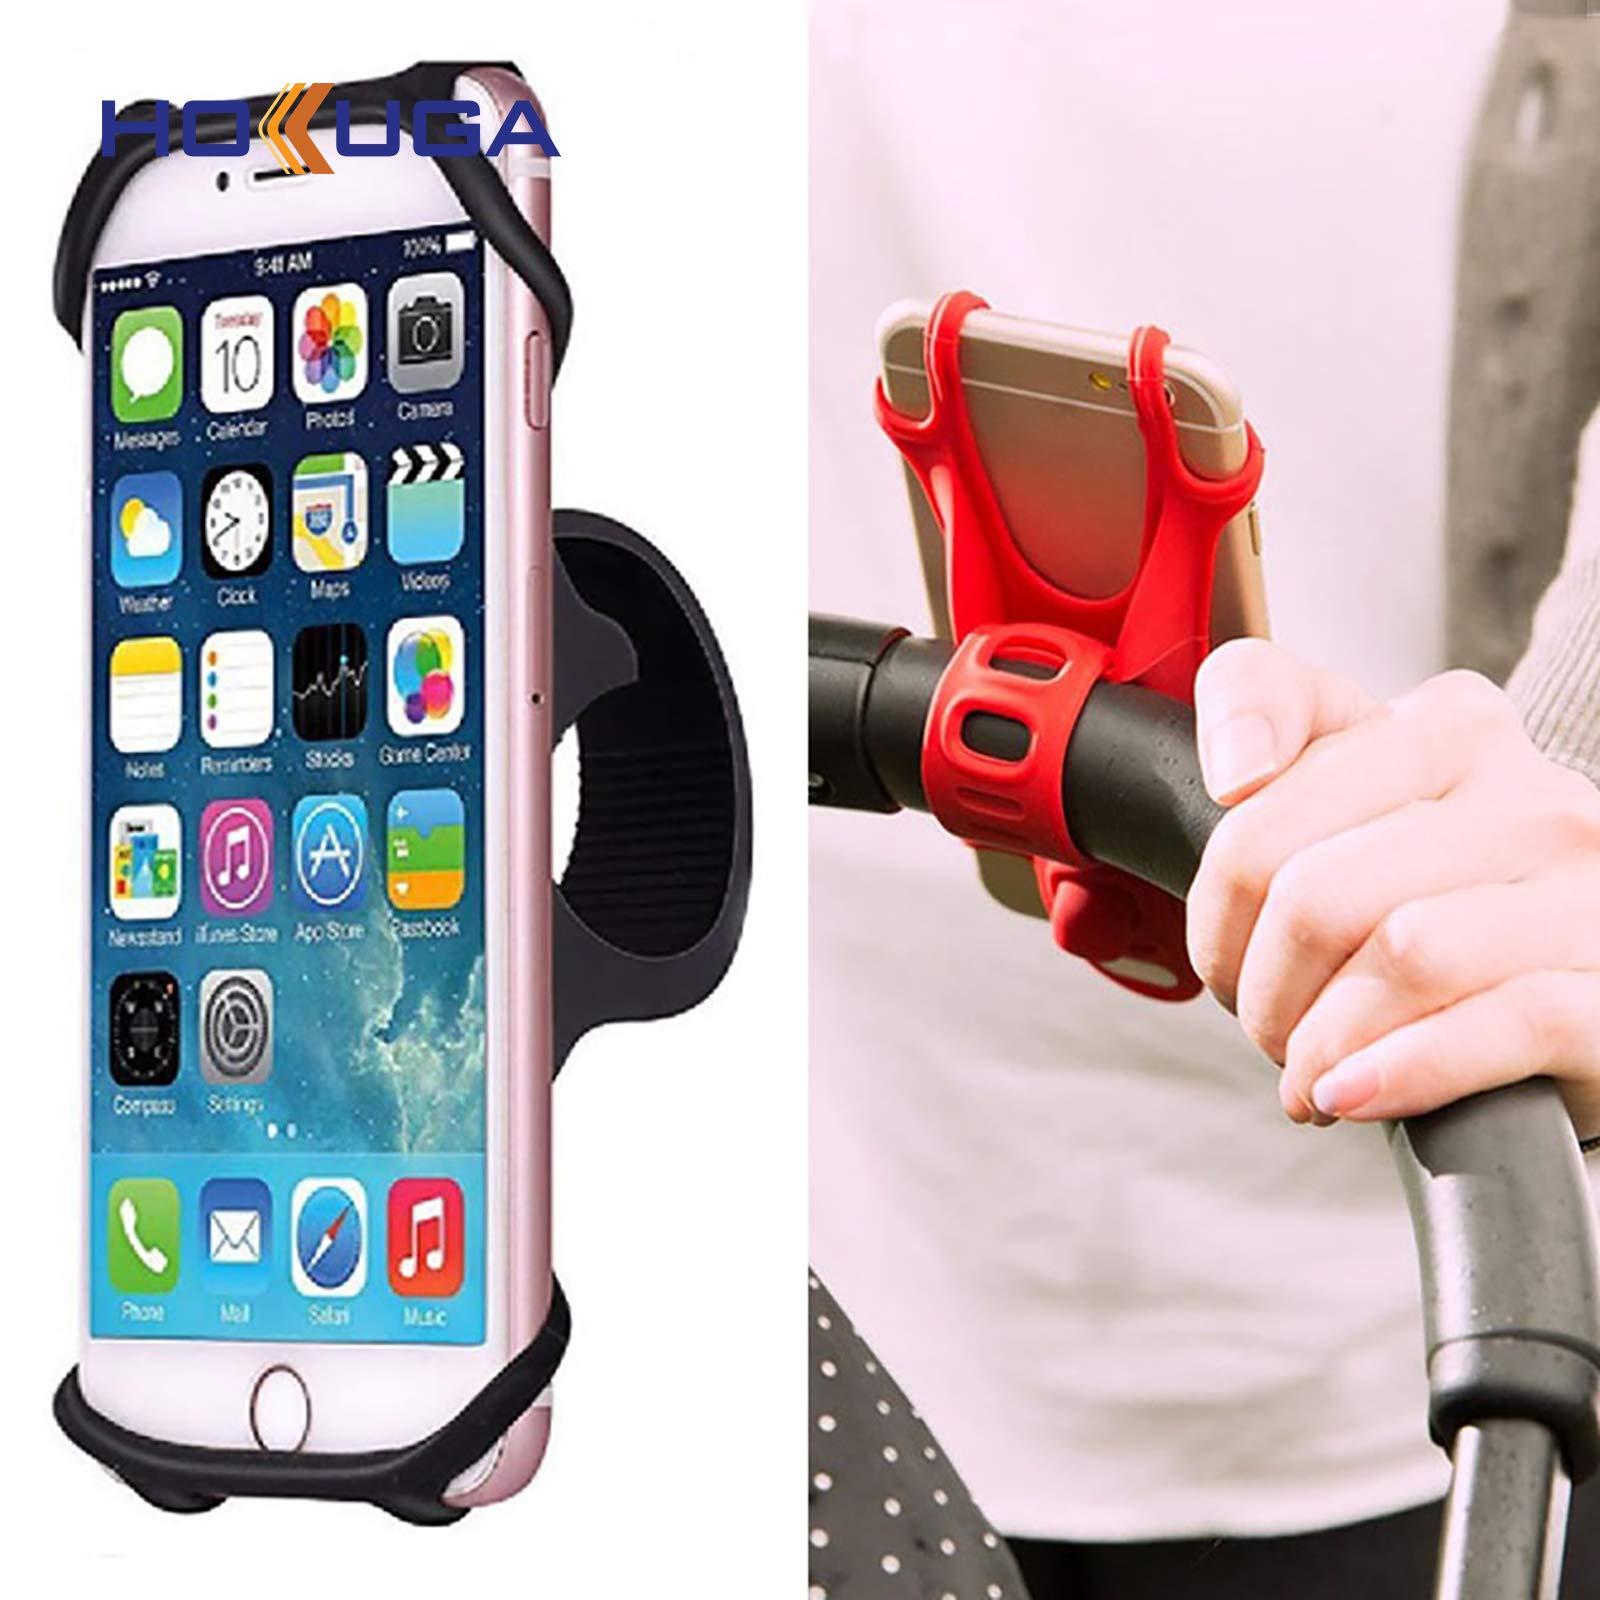 King Stroller Hooks - Stroller Hooks - Baby Stroller Accessories Universal Stroller Silicone Phone Holder Mobile Phone Holder for pram Moto Bicycle GPS Mount Bracket (Red) by HOKUGA